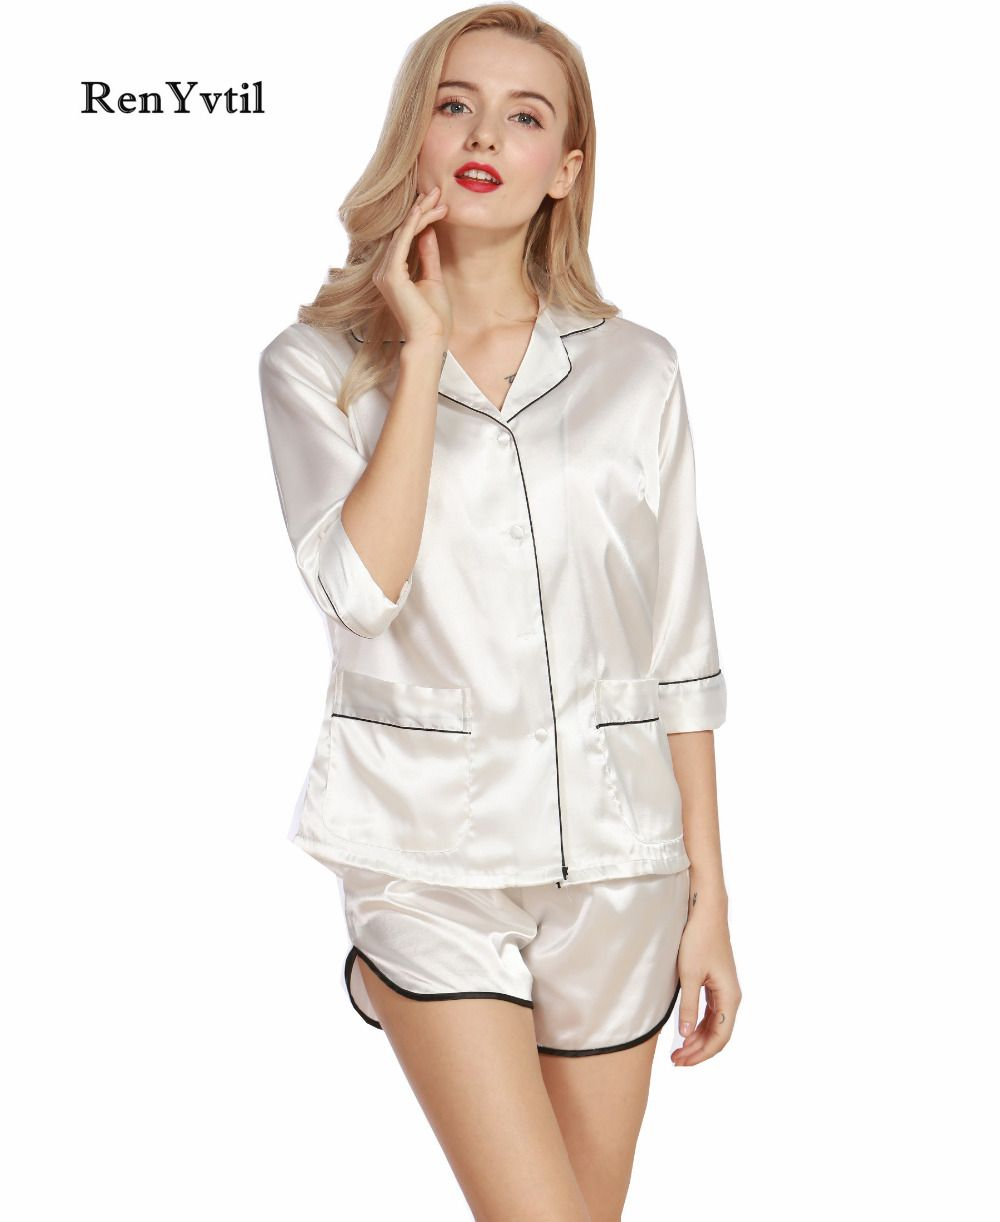 7f0d14bb7b RenYvtil Women Pajama Sets Summer 2017 Silky Ladies Pajamas Shorts 2 Pcs Set  Faux Silk Female